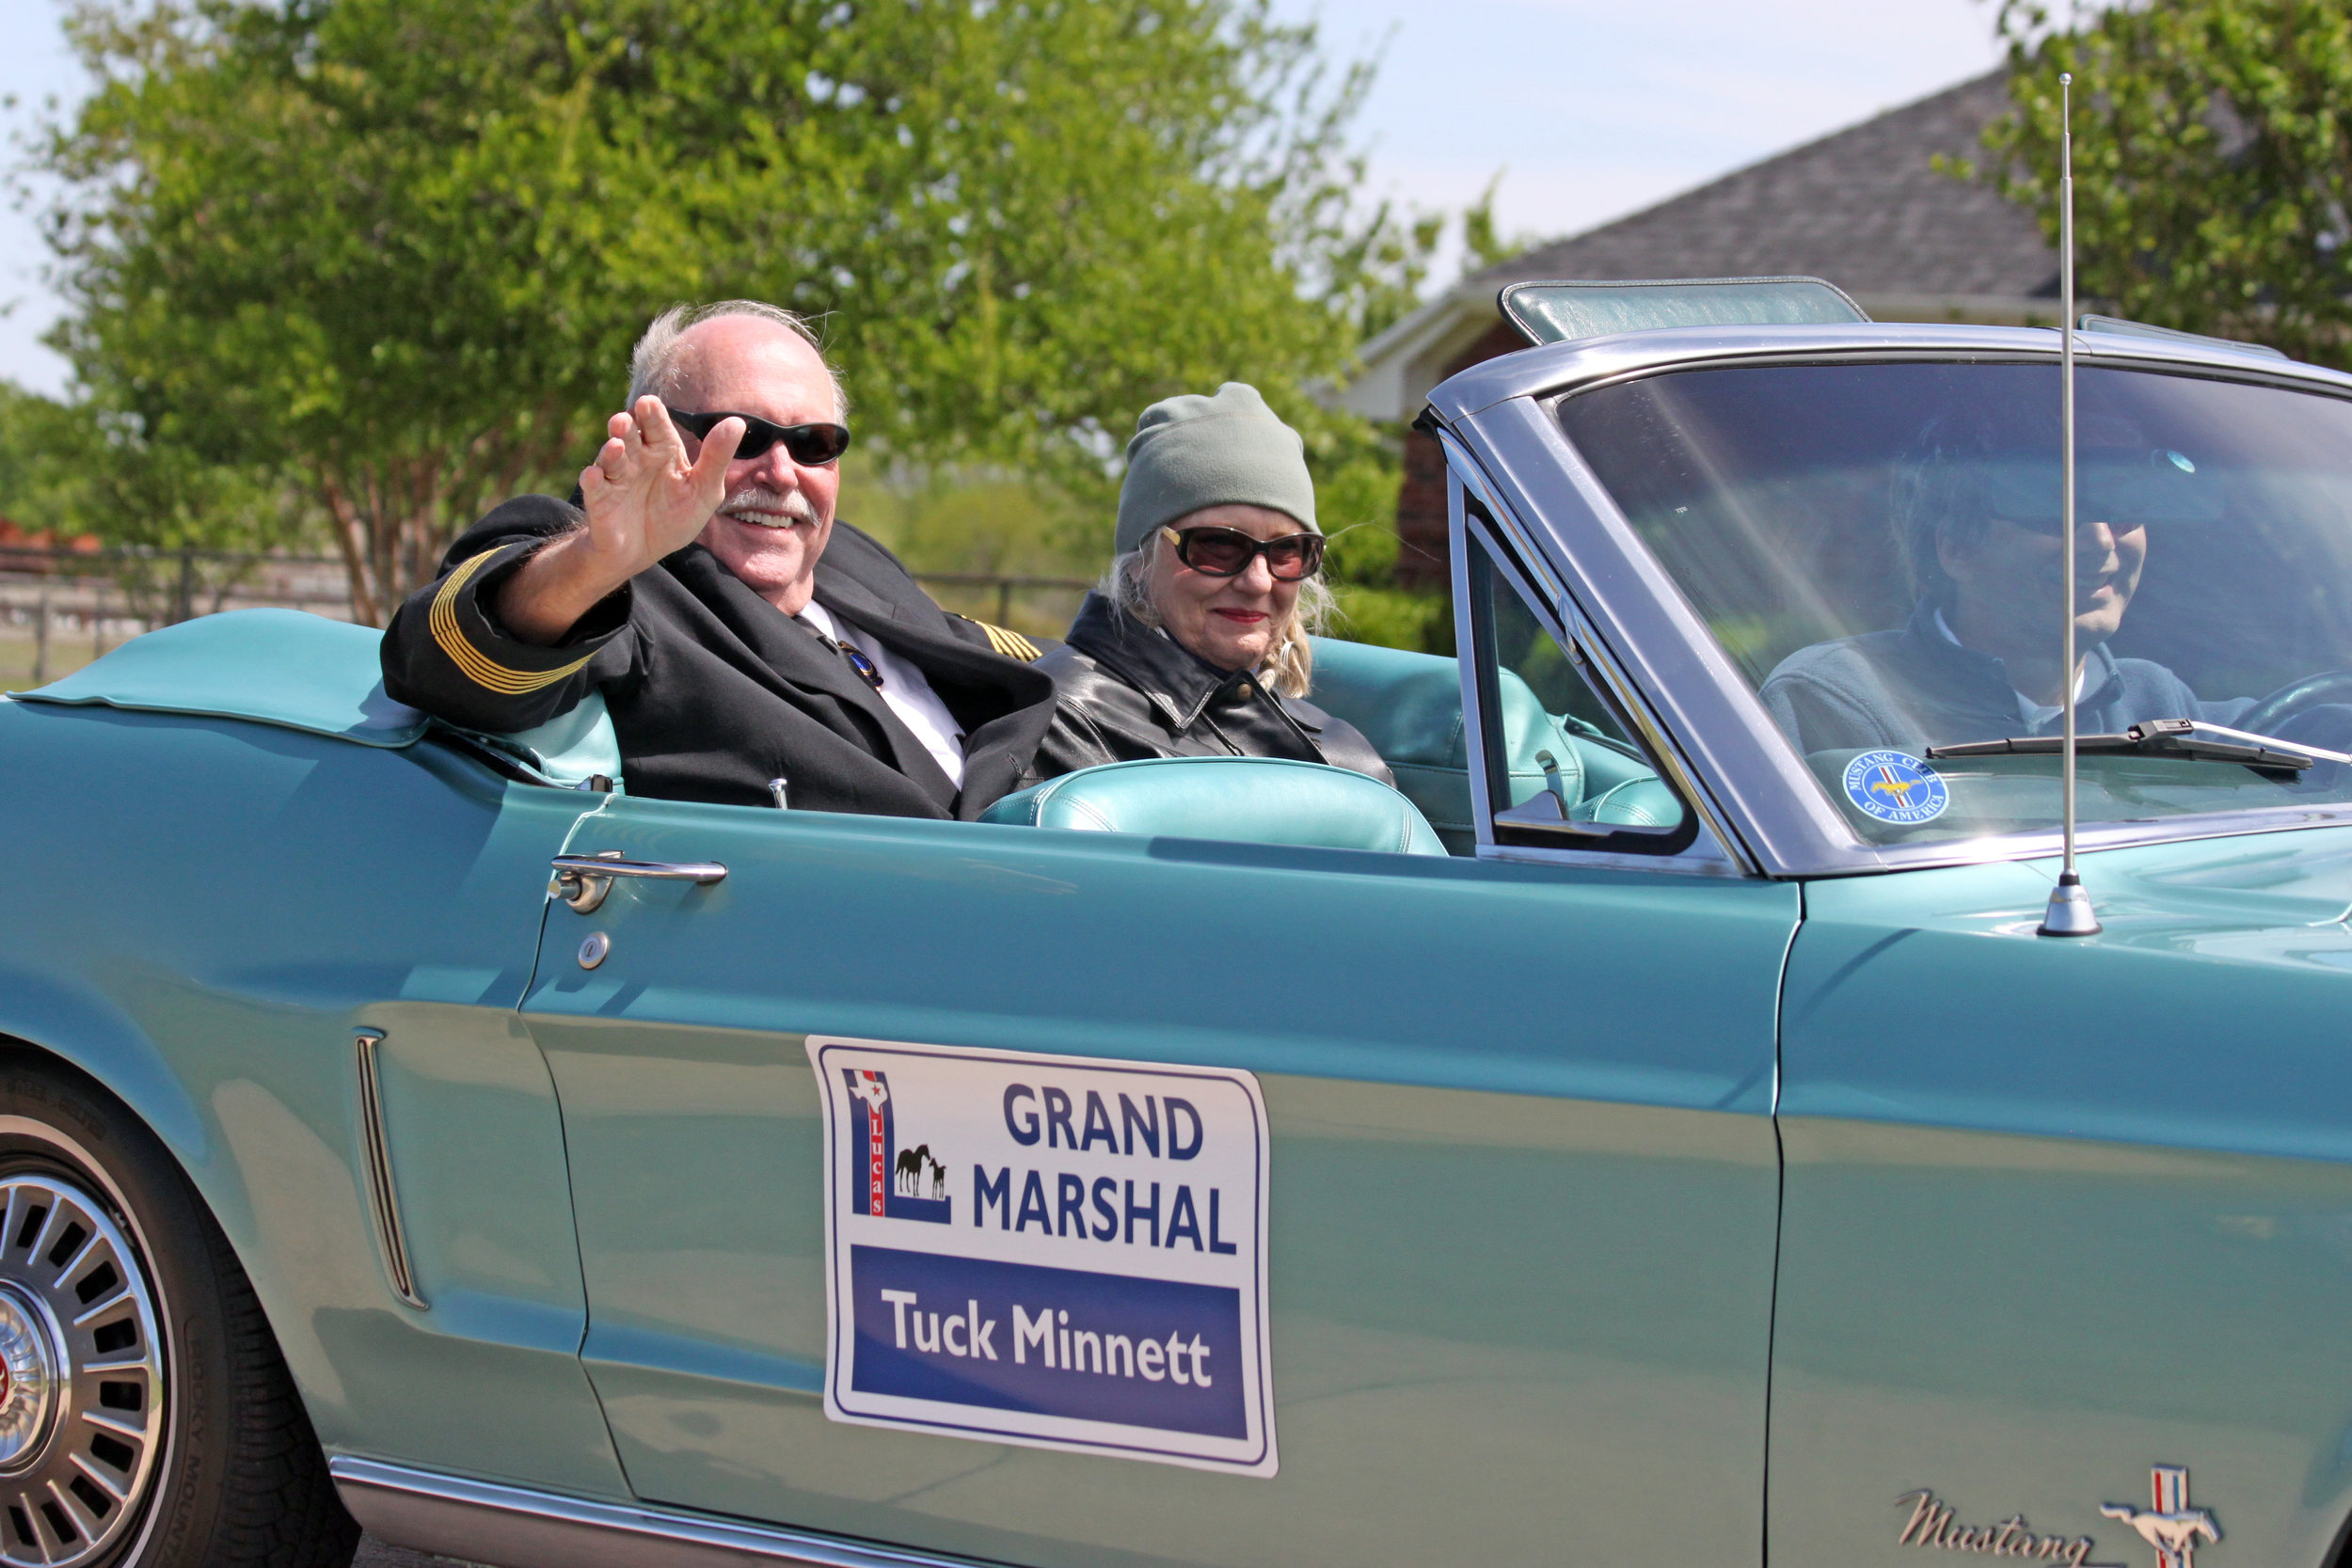 parade grand marshal.jpg